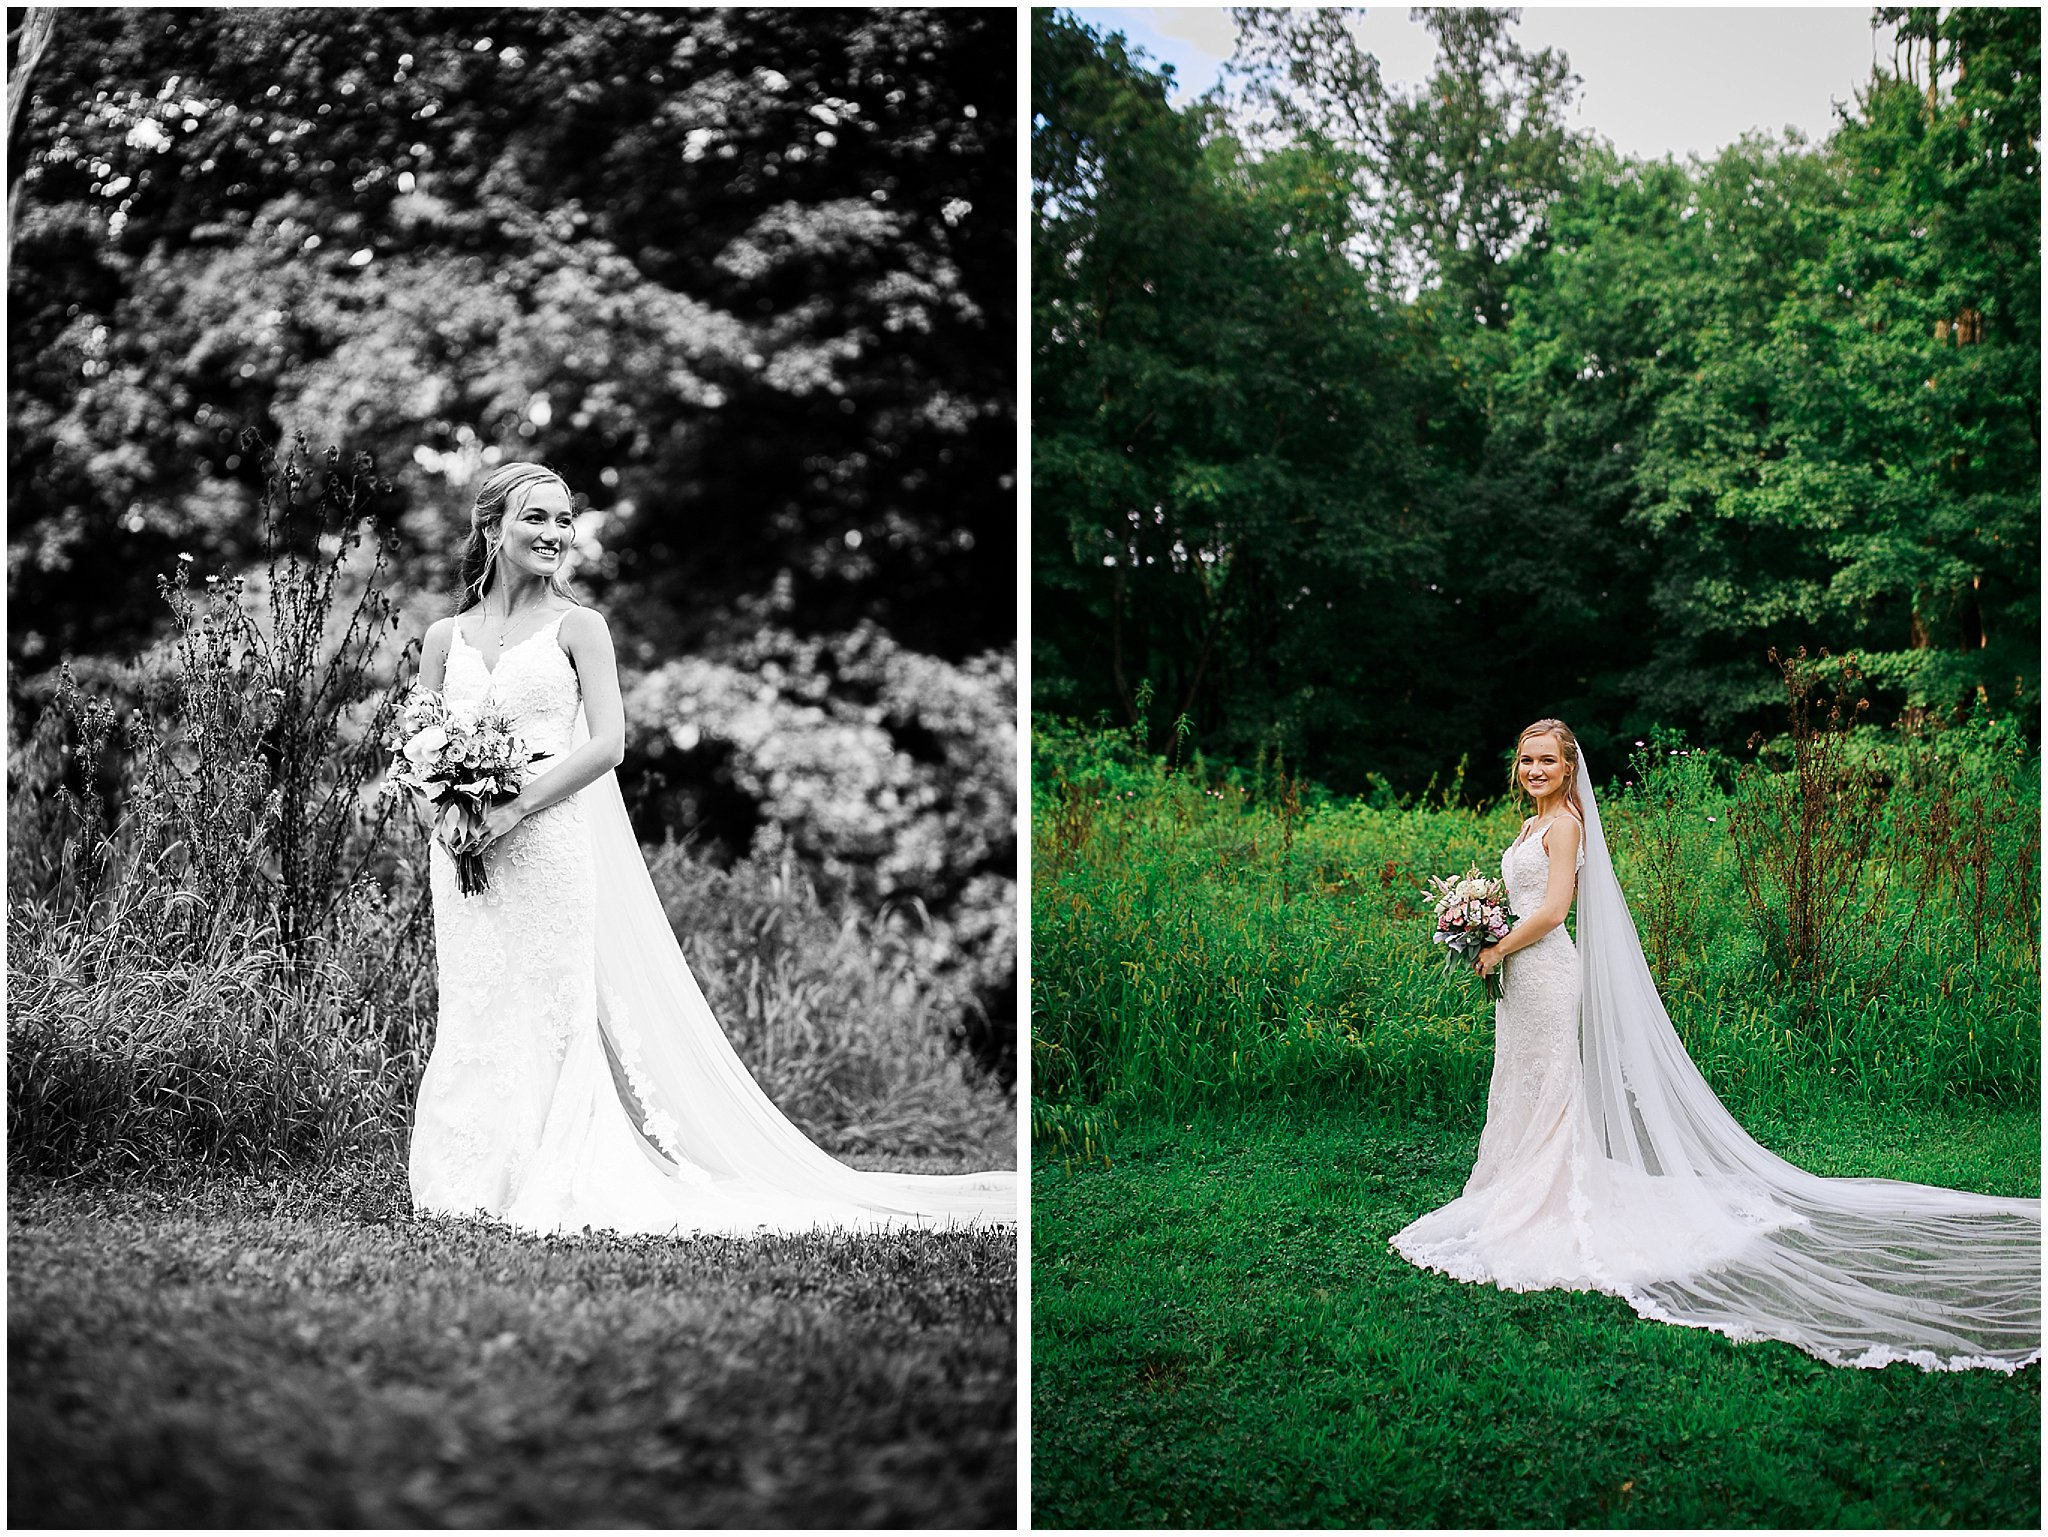 Preston Barn Old Drovers Inn Wedding Rustic Wedding Hudson Valley Photographer Sweet Alice Photography56.jpg